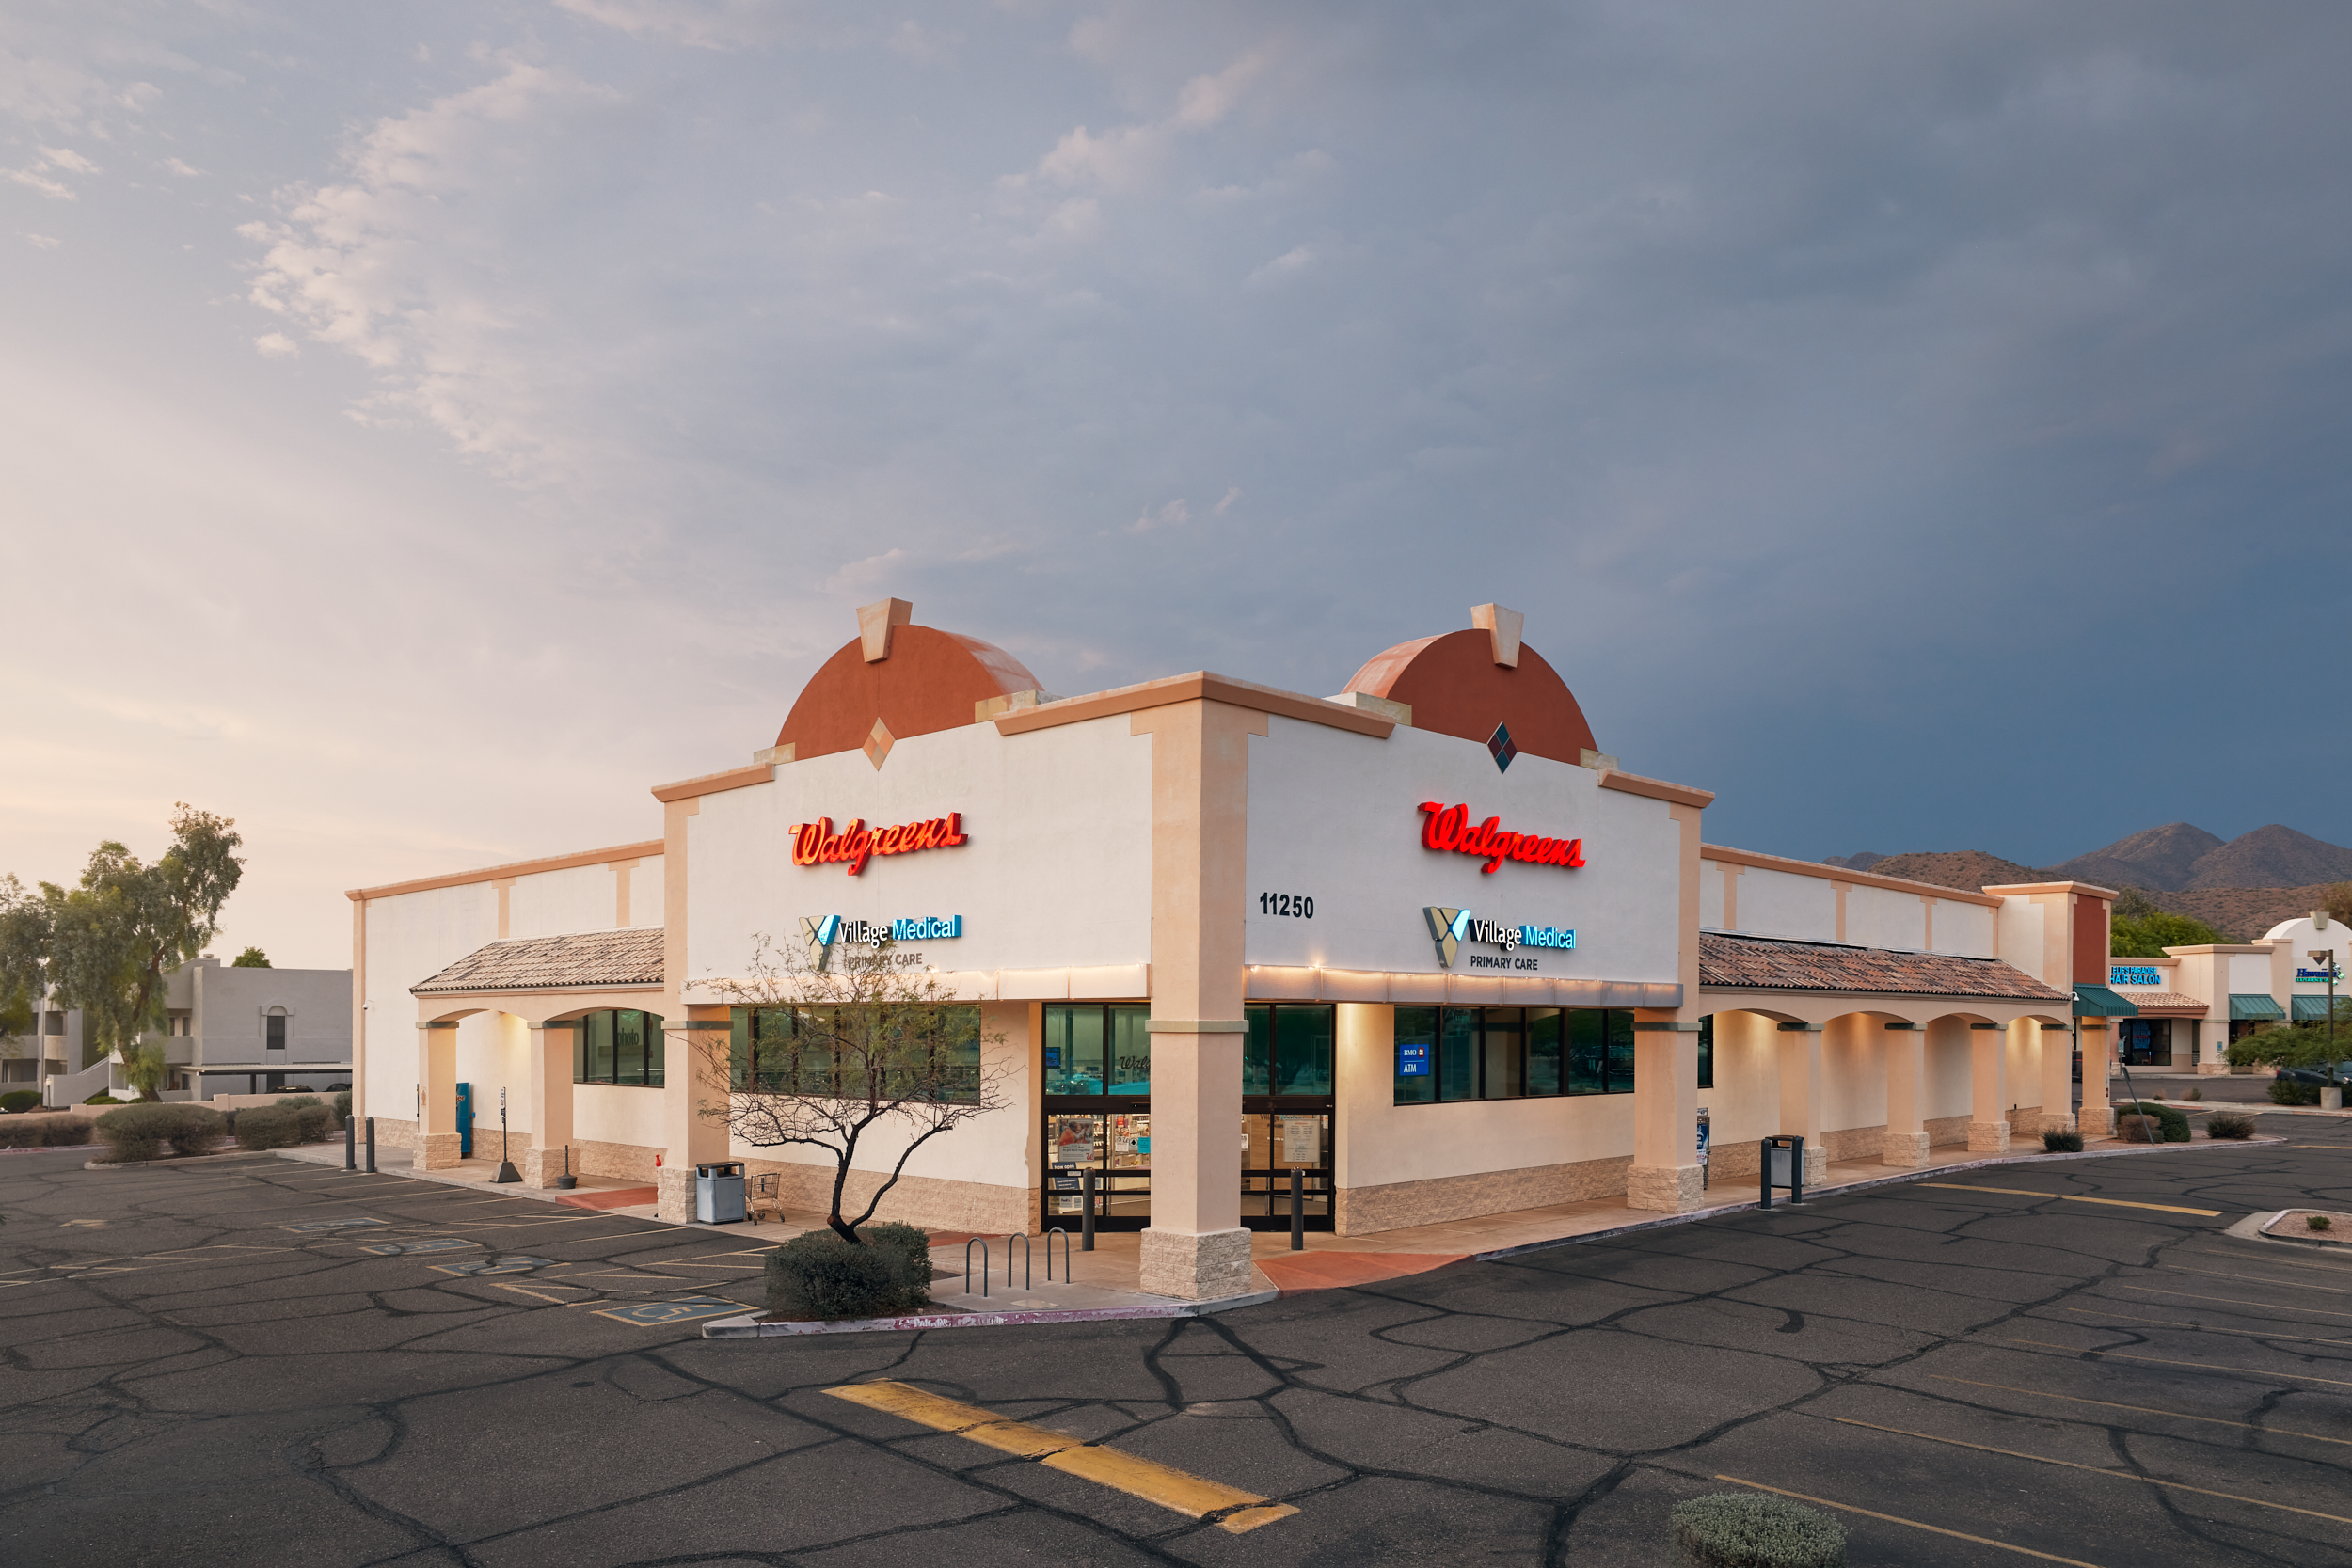 Village Medical at Walgreens - 11250 E. Via Linda  Ste. 101 Scottsdale, AZ 85259